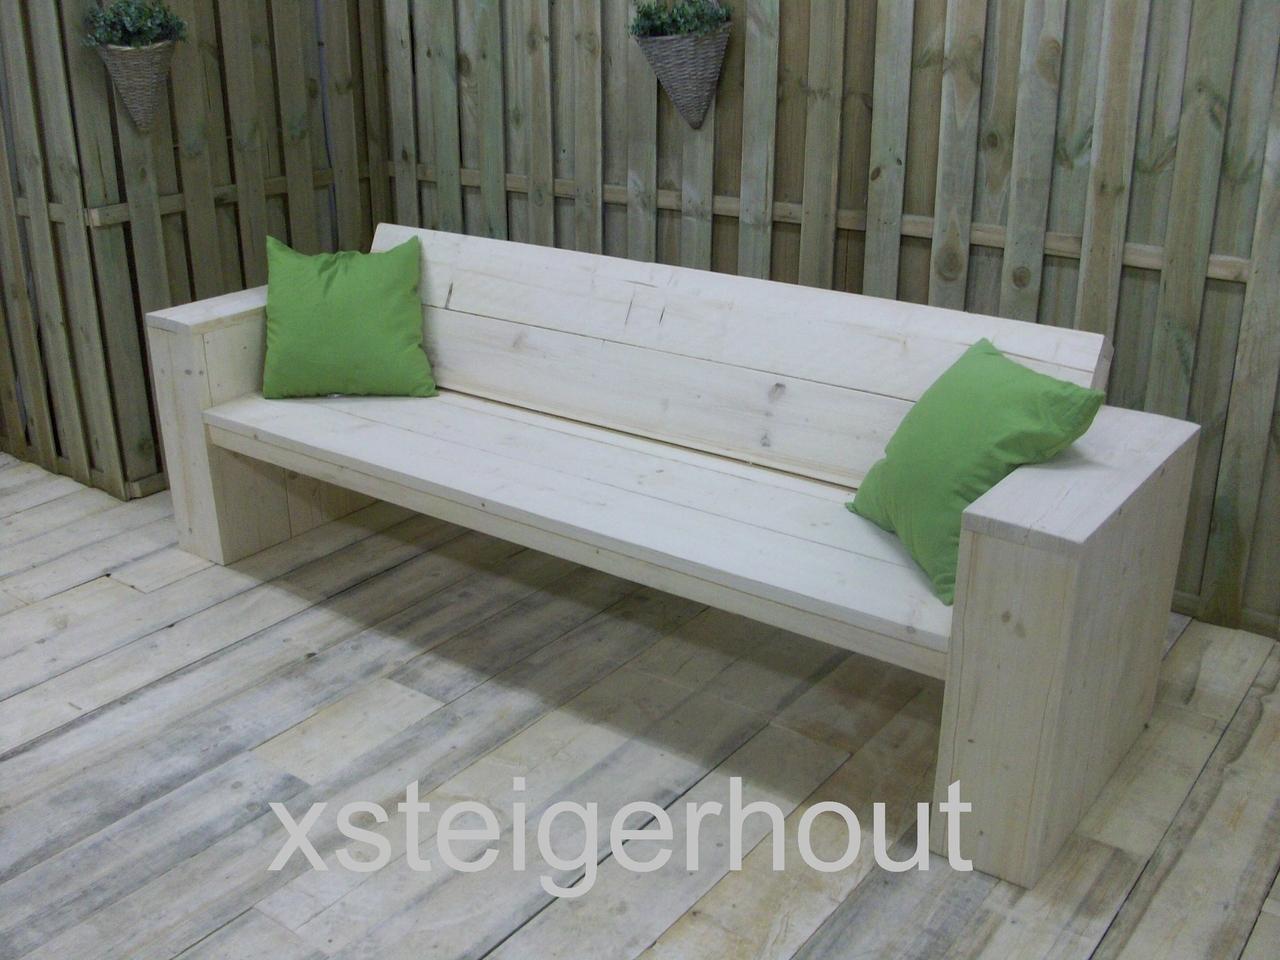 Eetbank Van Steigerhout.Loungebank Steigerhout Bouwpakket V A 109 Xsteigerhout Nl